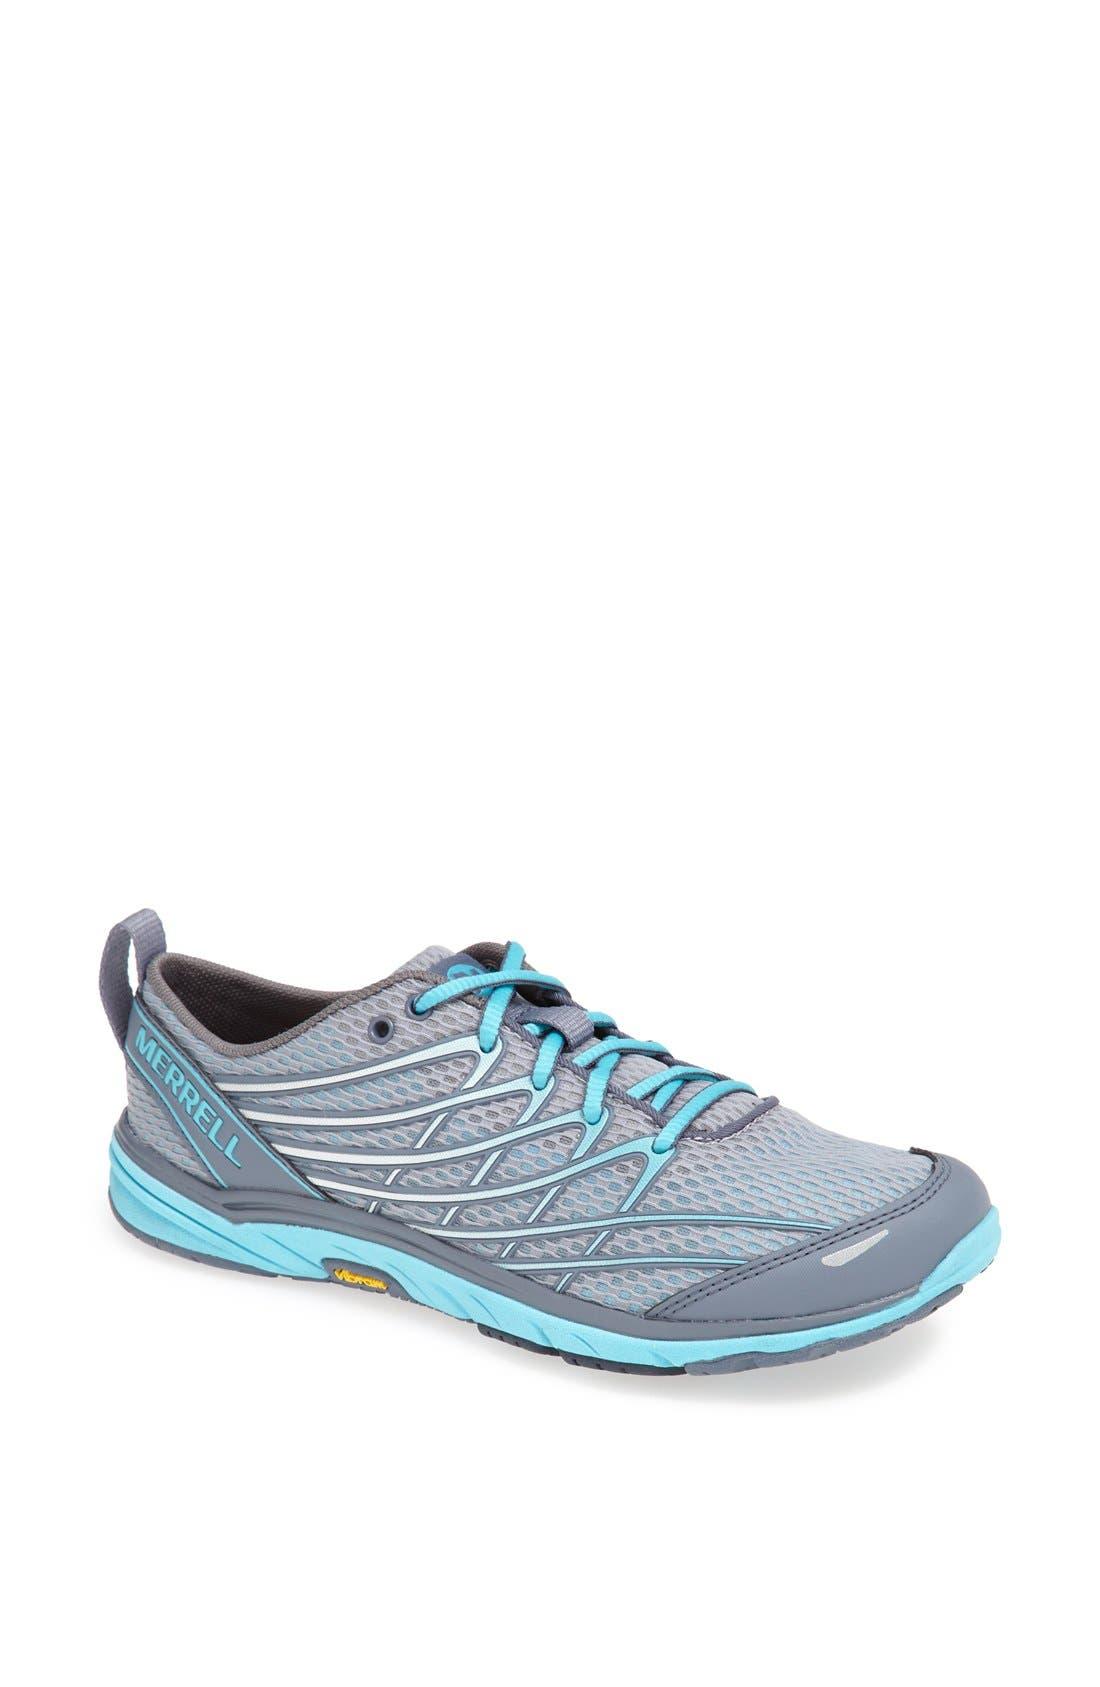 Alternate Image 1 Selected - Merrell 'Bare Access Arc 3' Running Shoe (Women)